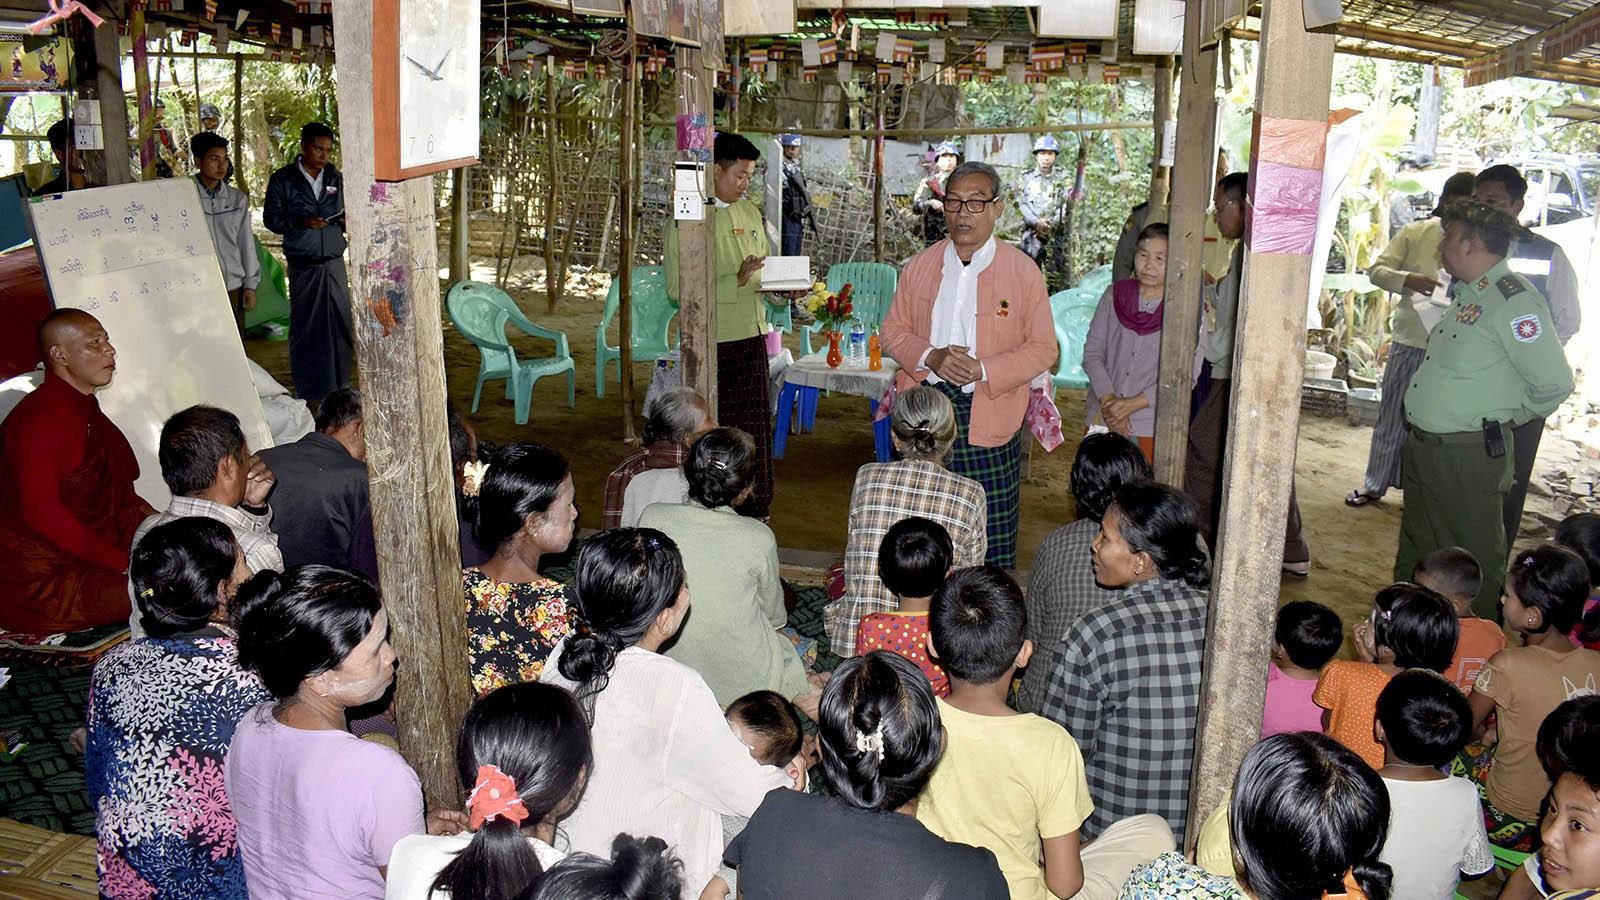 Rakhine State Chief Minister U Nyi Pu meets with IDPs at a monastery in Sittway, Rakhine State. Photo: Tin Tun